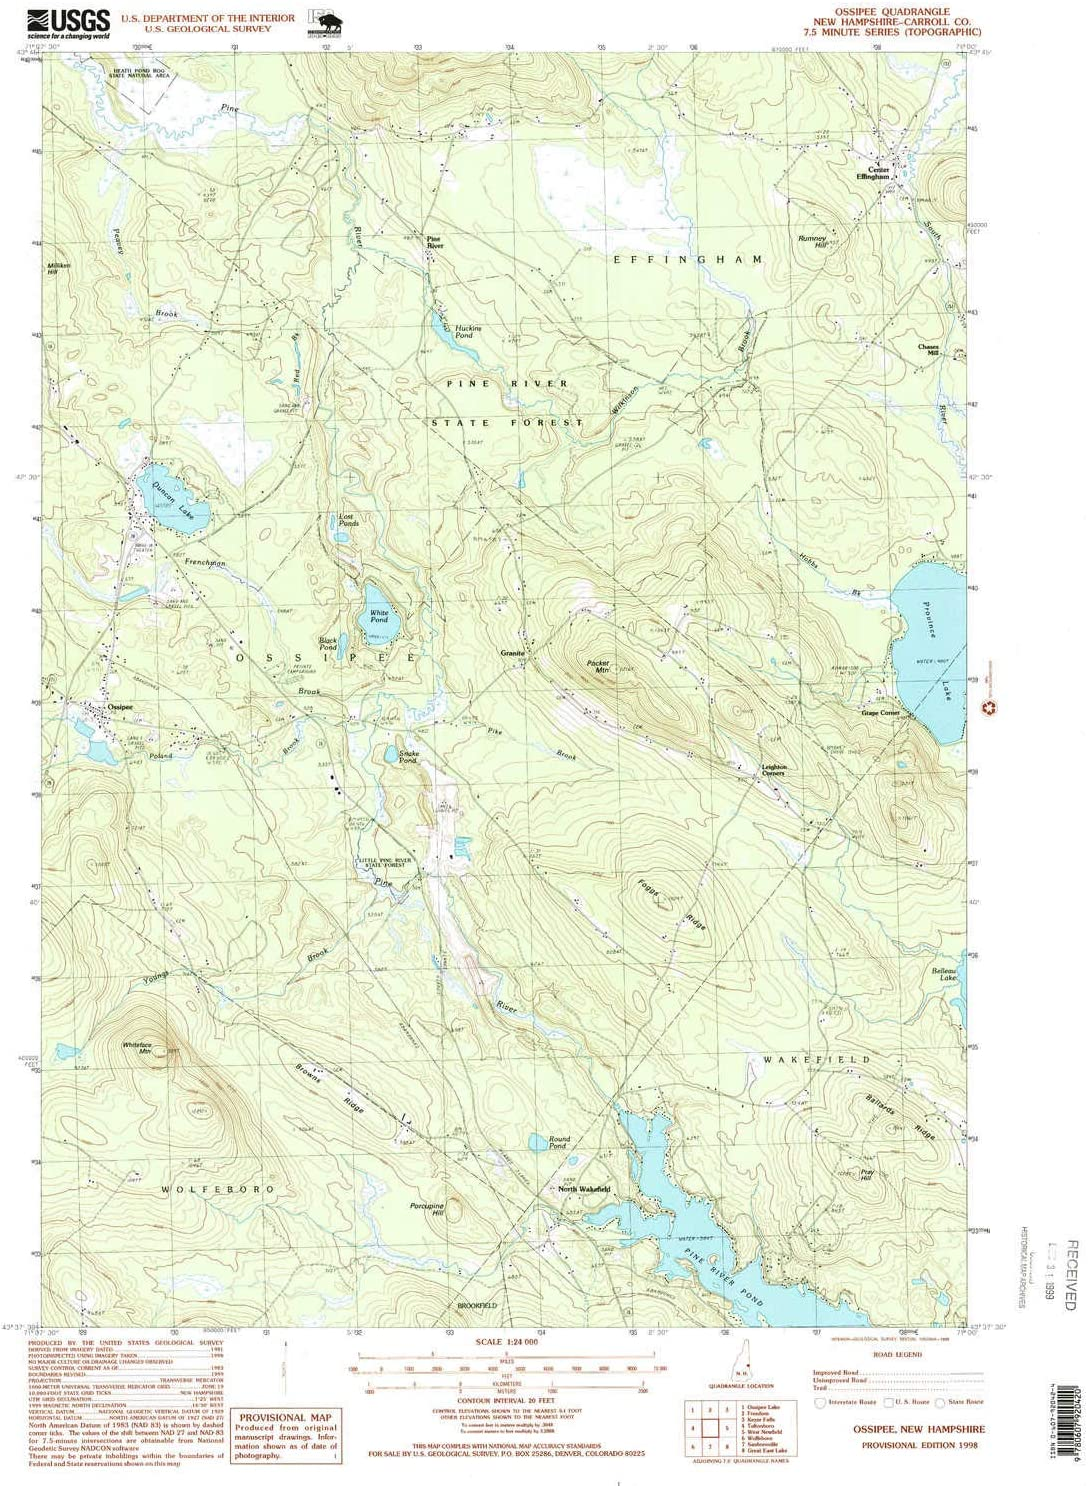 YellowMaps 大注目 Ossipee NH topo map 7.5 Scale Minute 1:24000 迅速な対応で商品をお届け致します X